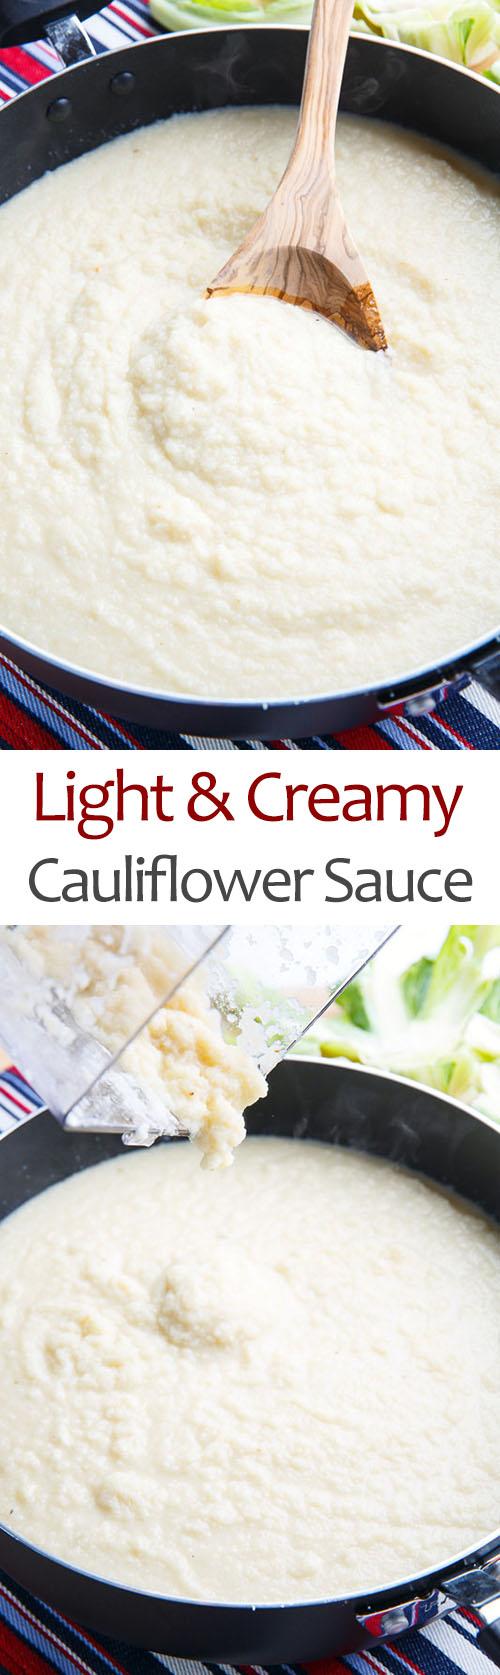 Light and Creamy Cauliflower Sauce